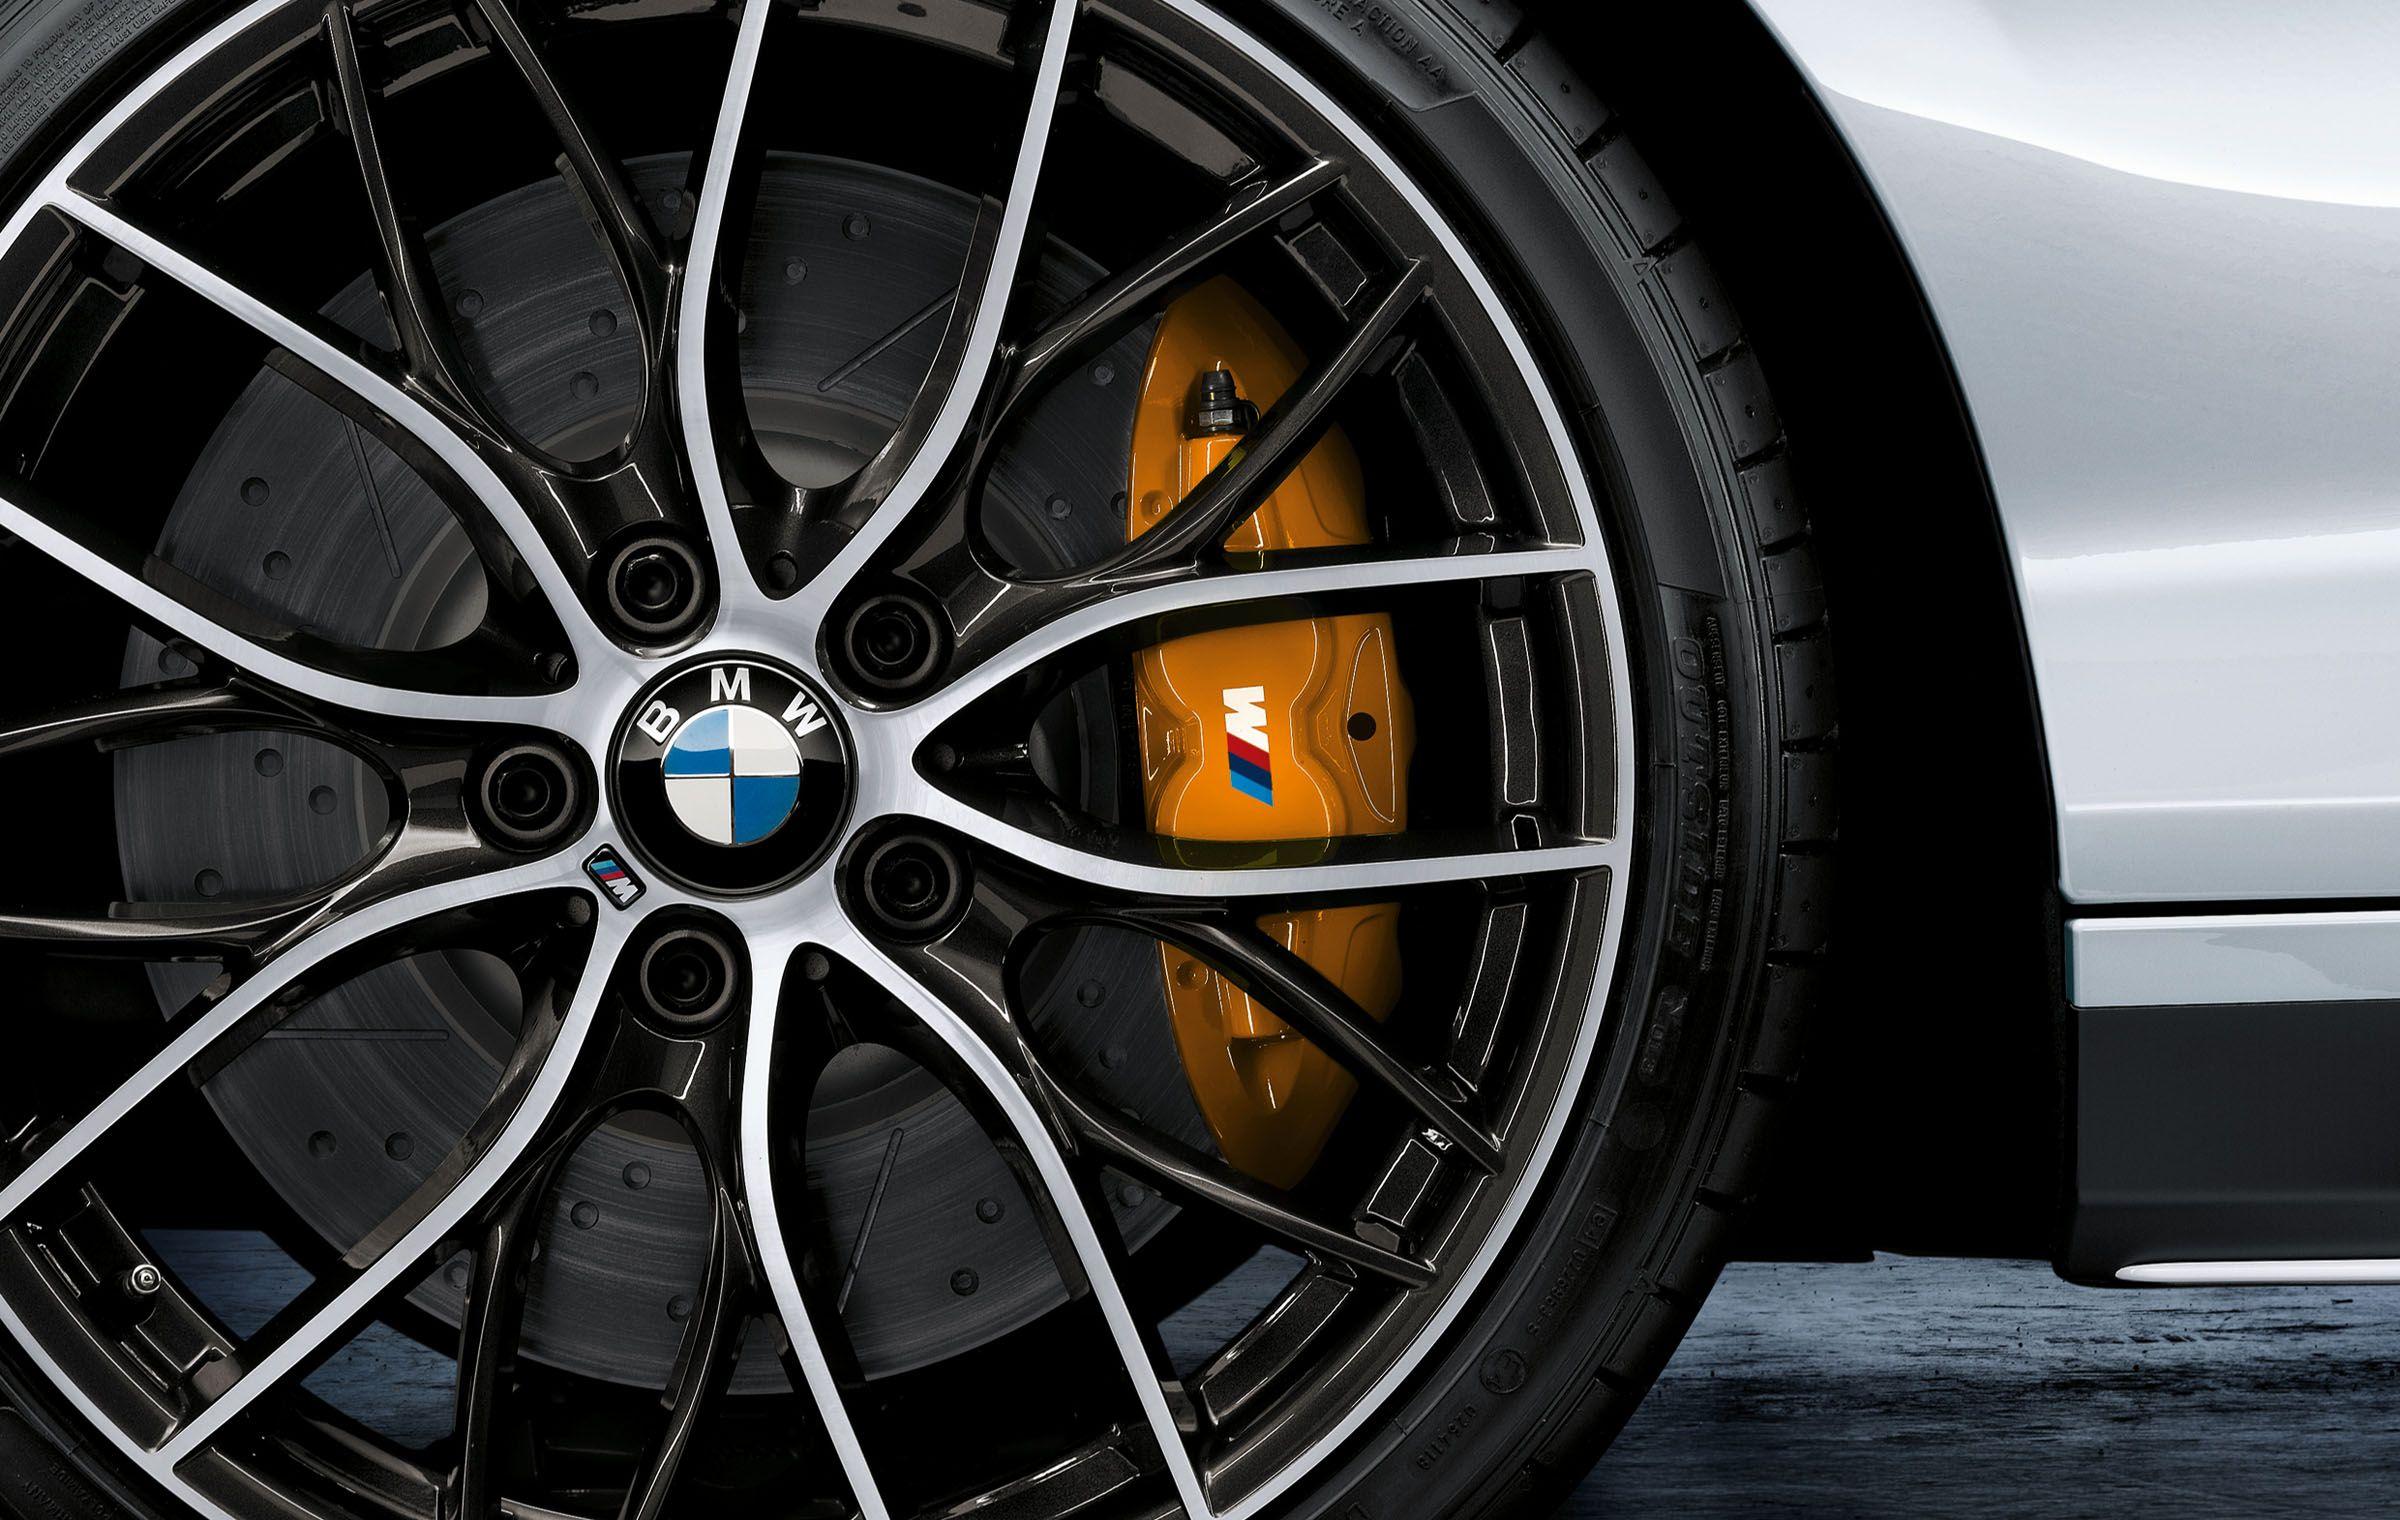 Wheel On Audi Tt Hd Oringe Google Search Performance Brakes